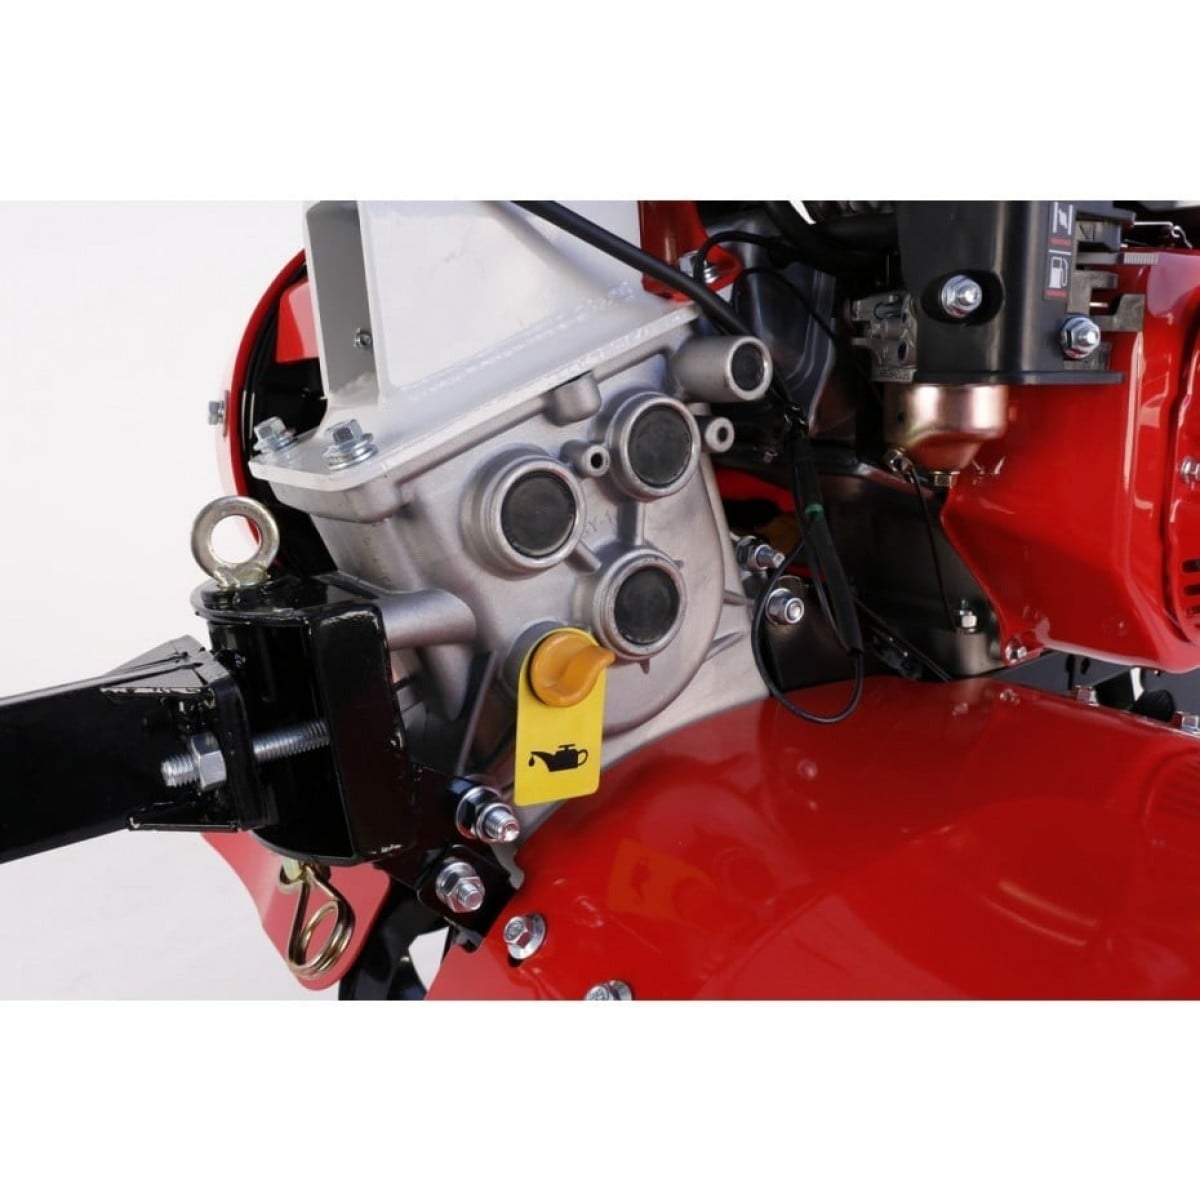 motocultor loncin lc750 7cp o mac.ro 7 2 86